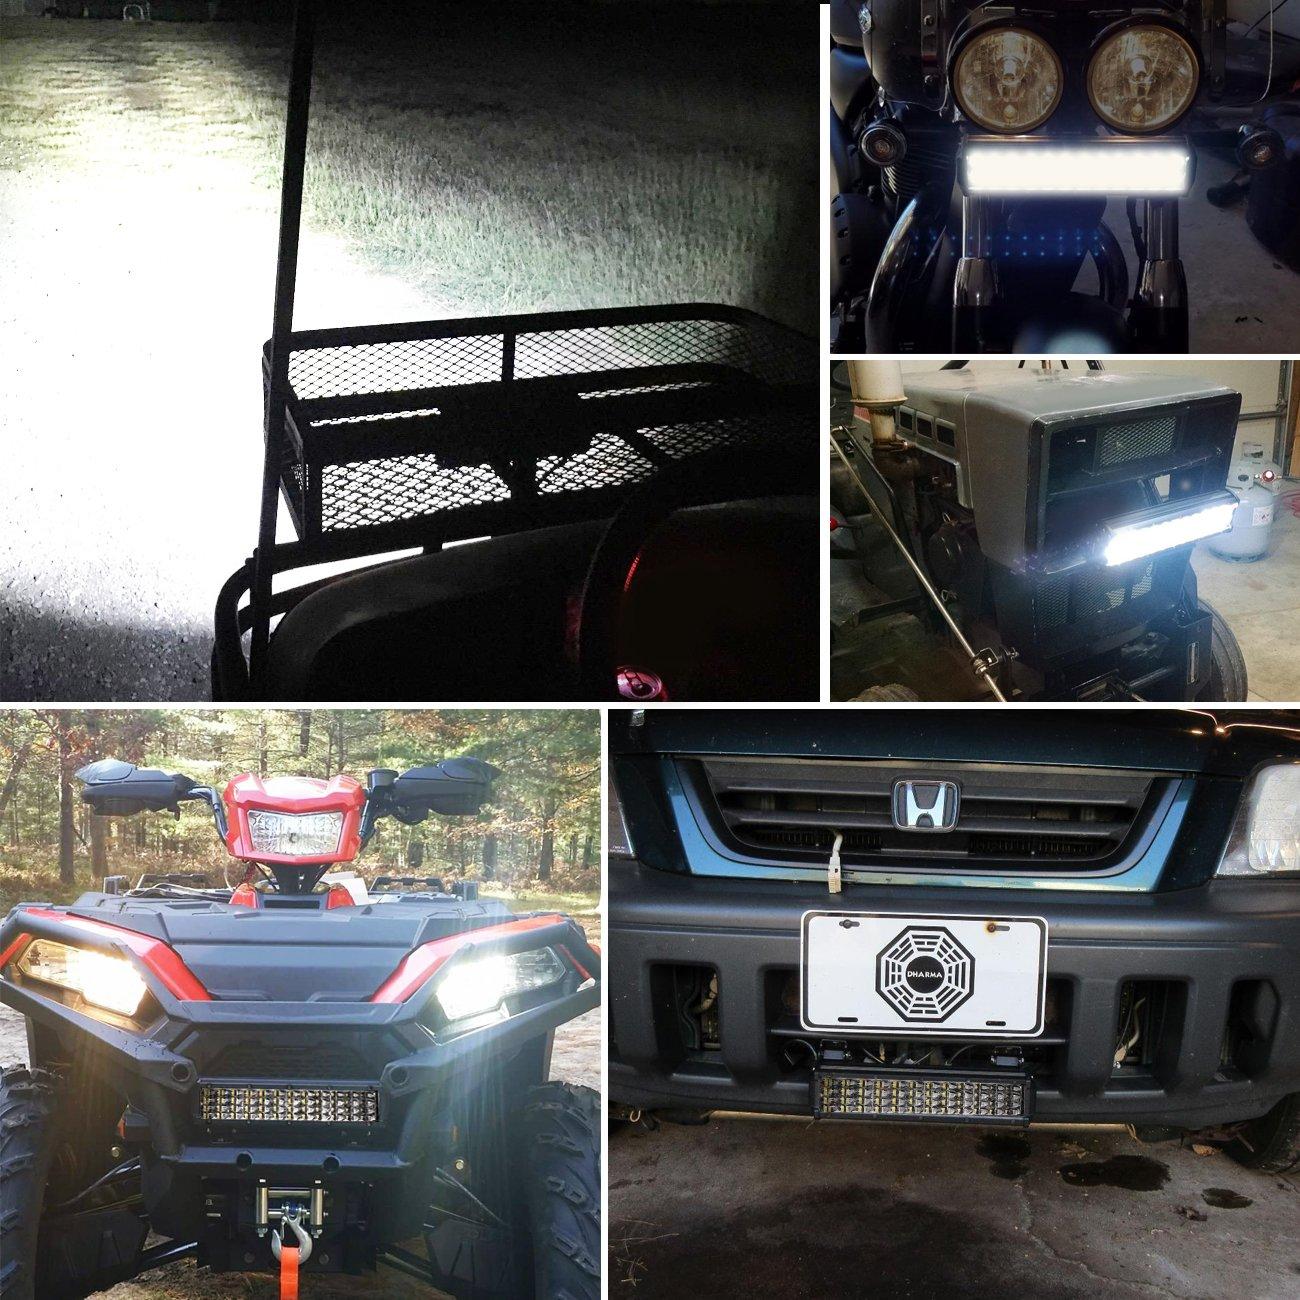 2pcs 6 120W Quad Row Light Bar Off Road Driving Fog Lights Cree Led Cubes Boat Lights Flood Work Lights for Truck ATV UTV SUV Jeep Marine Auto Power Plus LED Pods 2 Years Warranty